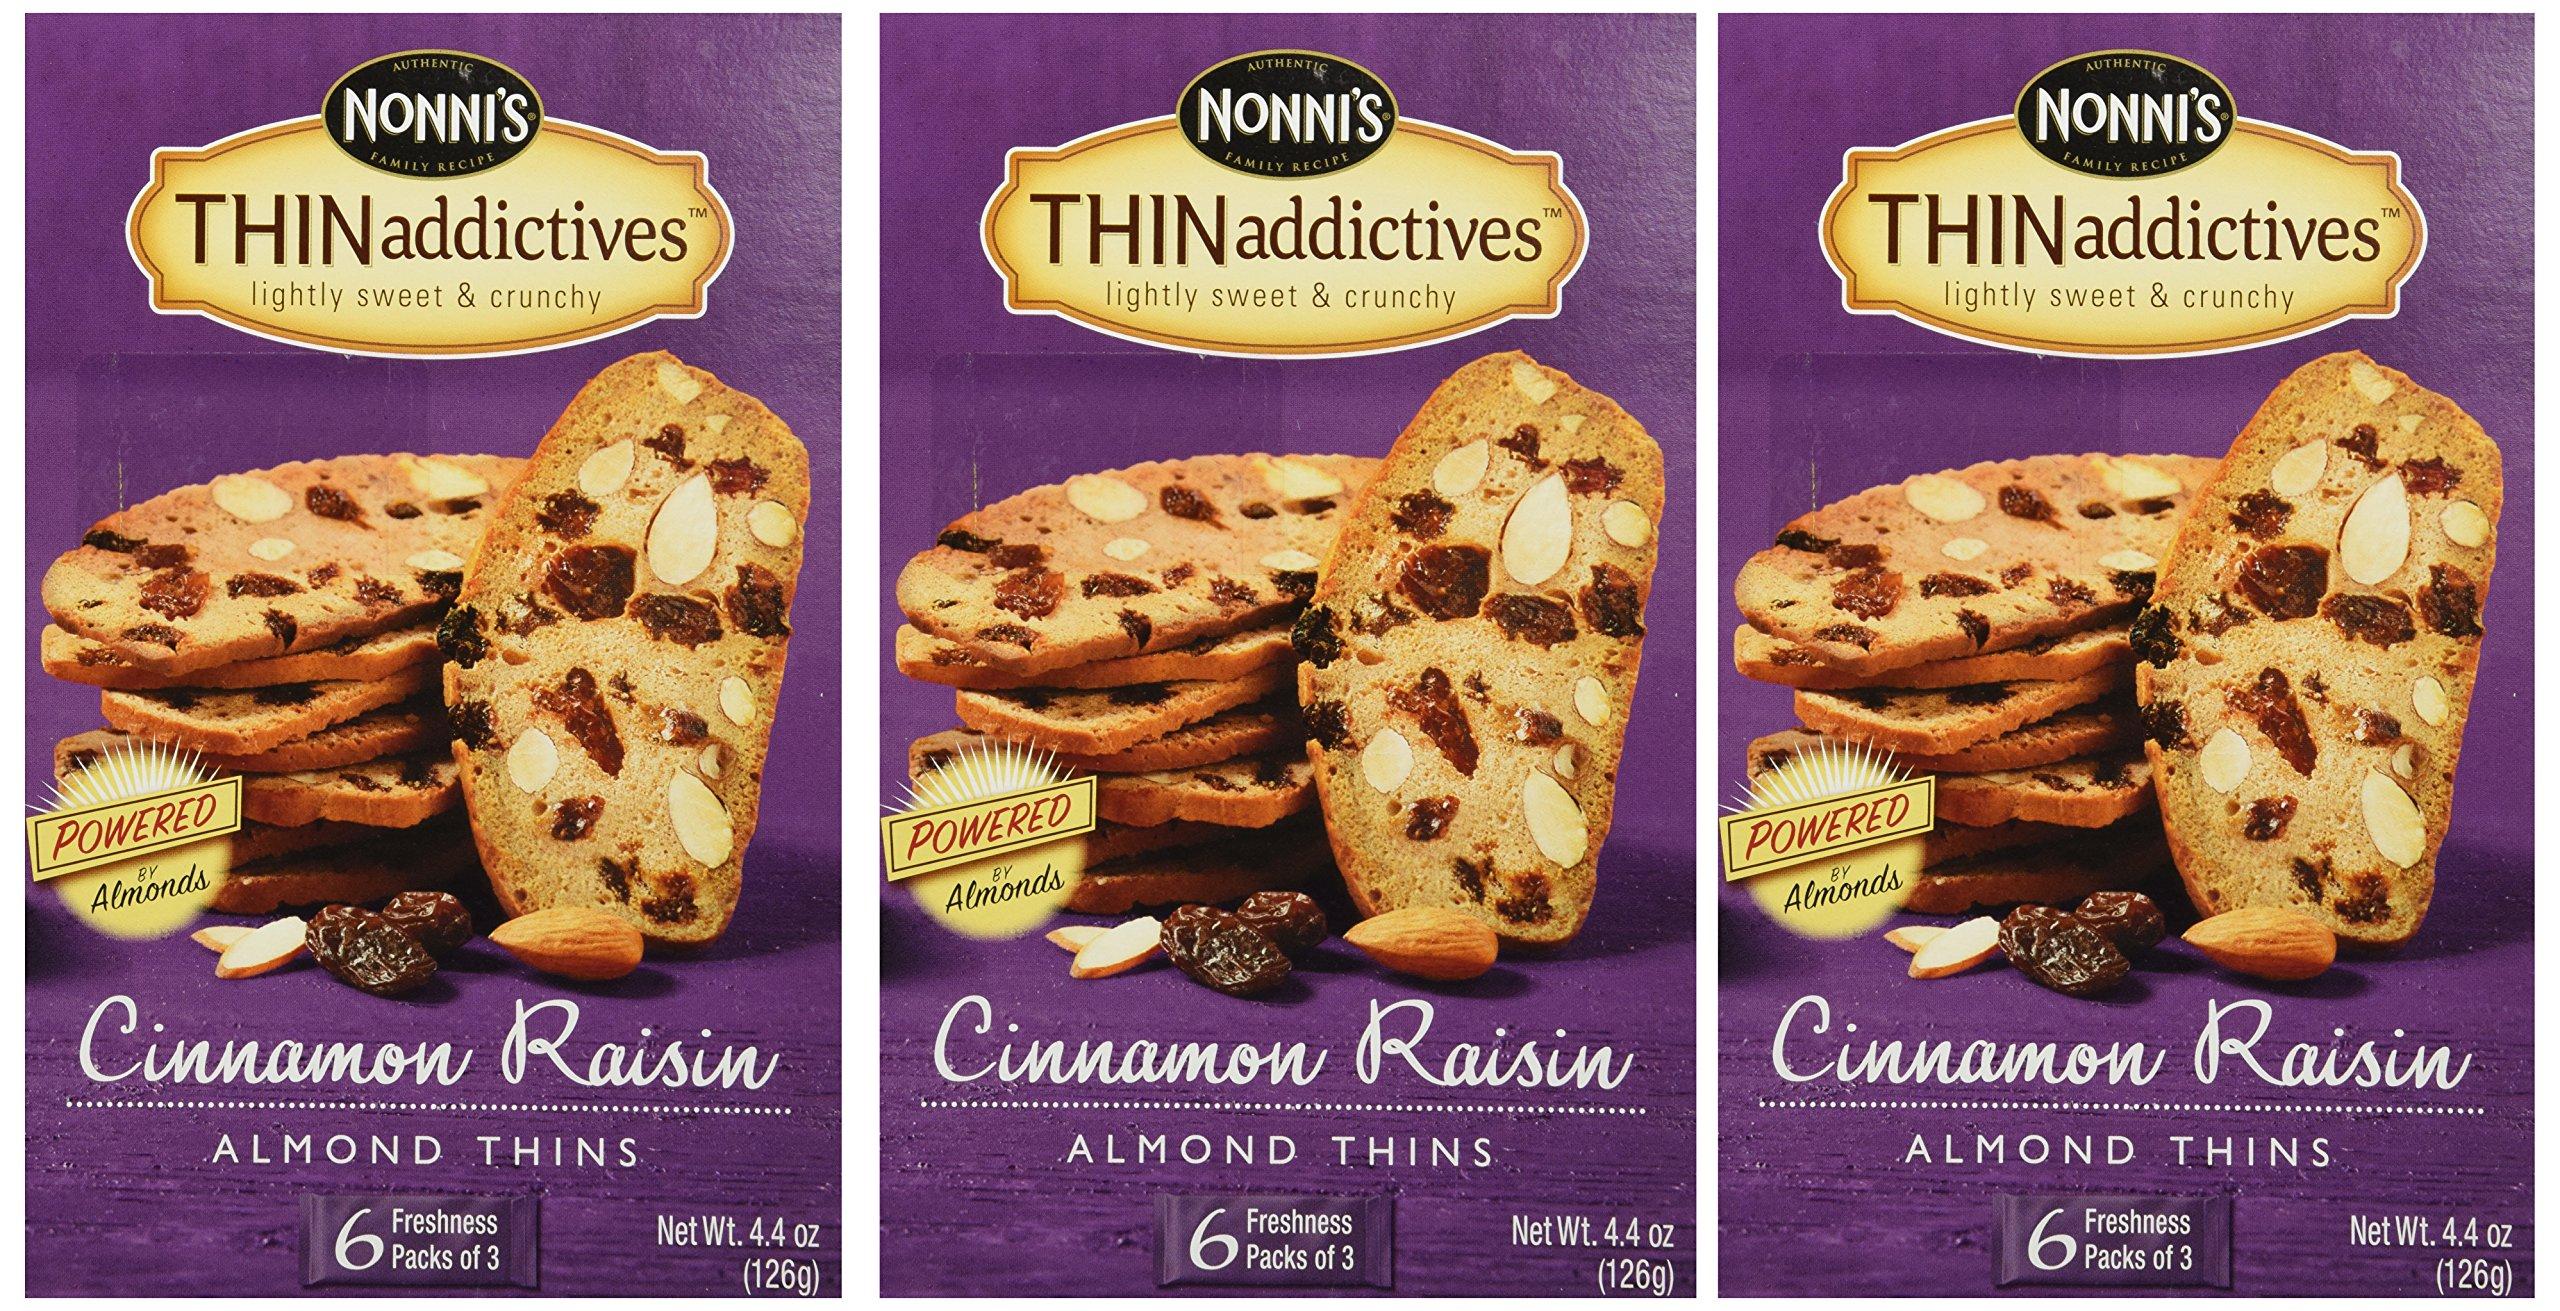 Nonni's Thin Addictives Cinnamon Raisin Almond Thins 6 pkgs ( 3 Pack)